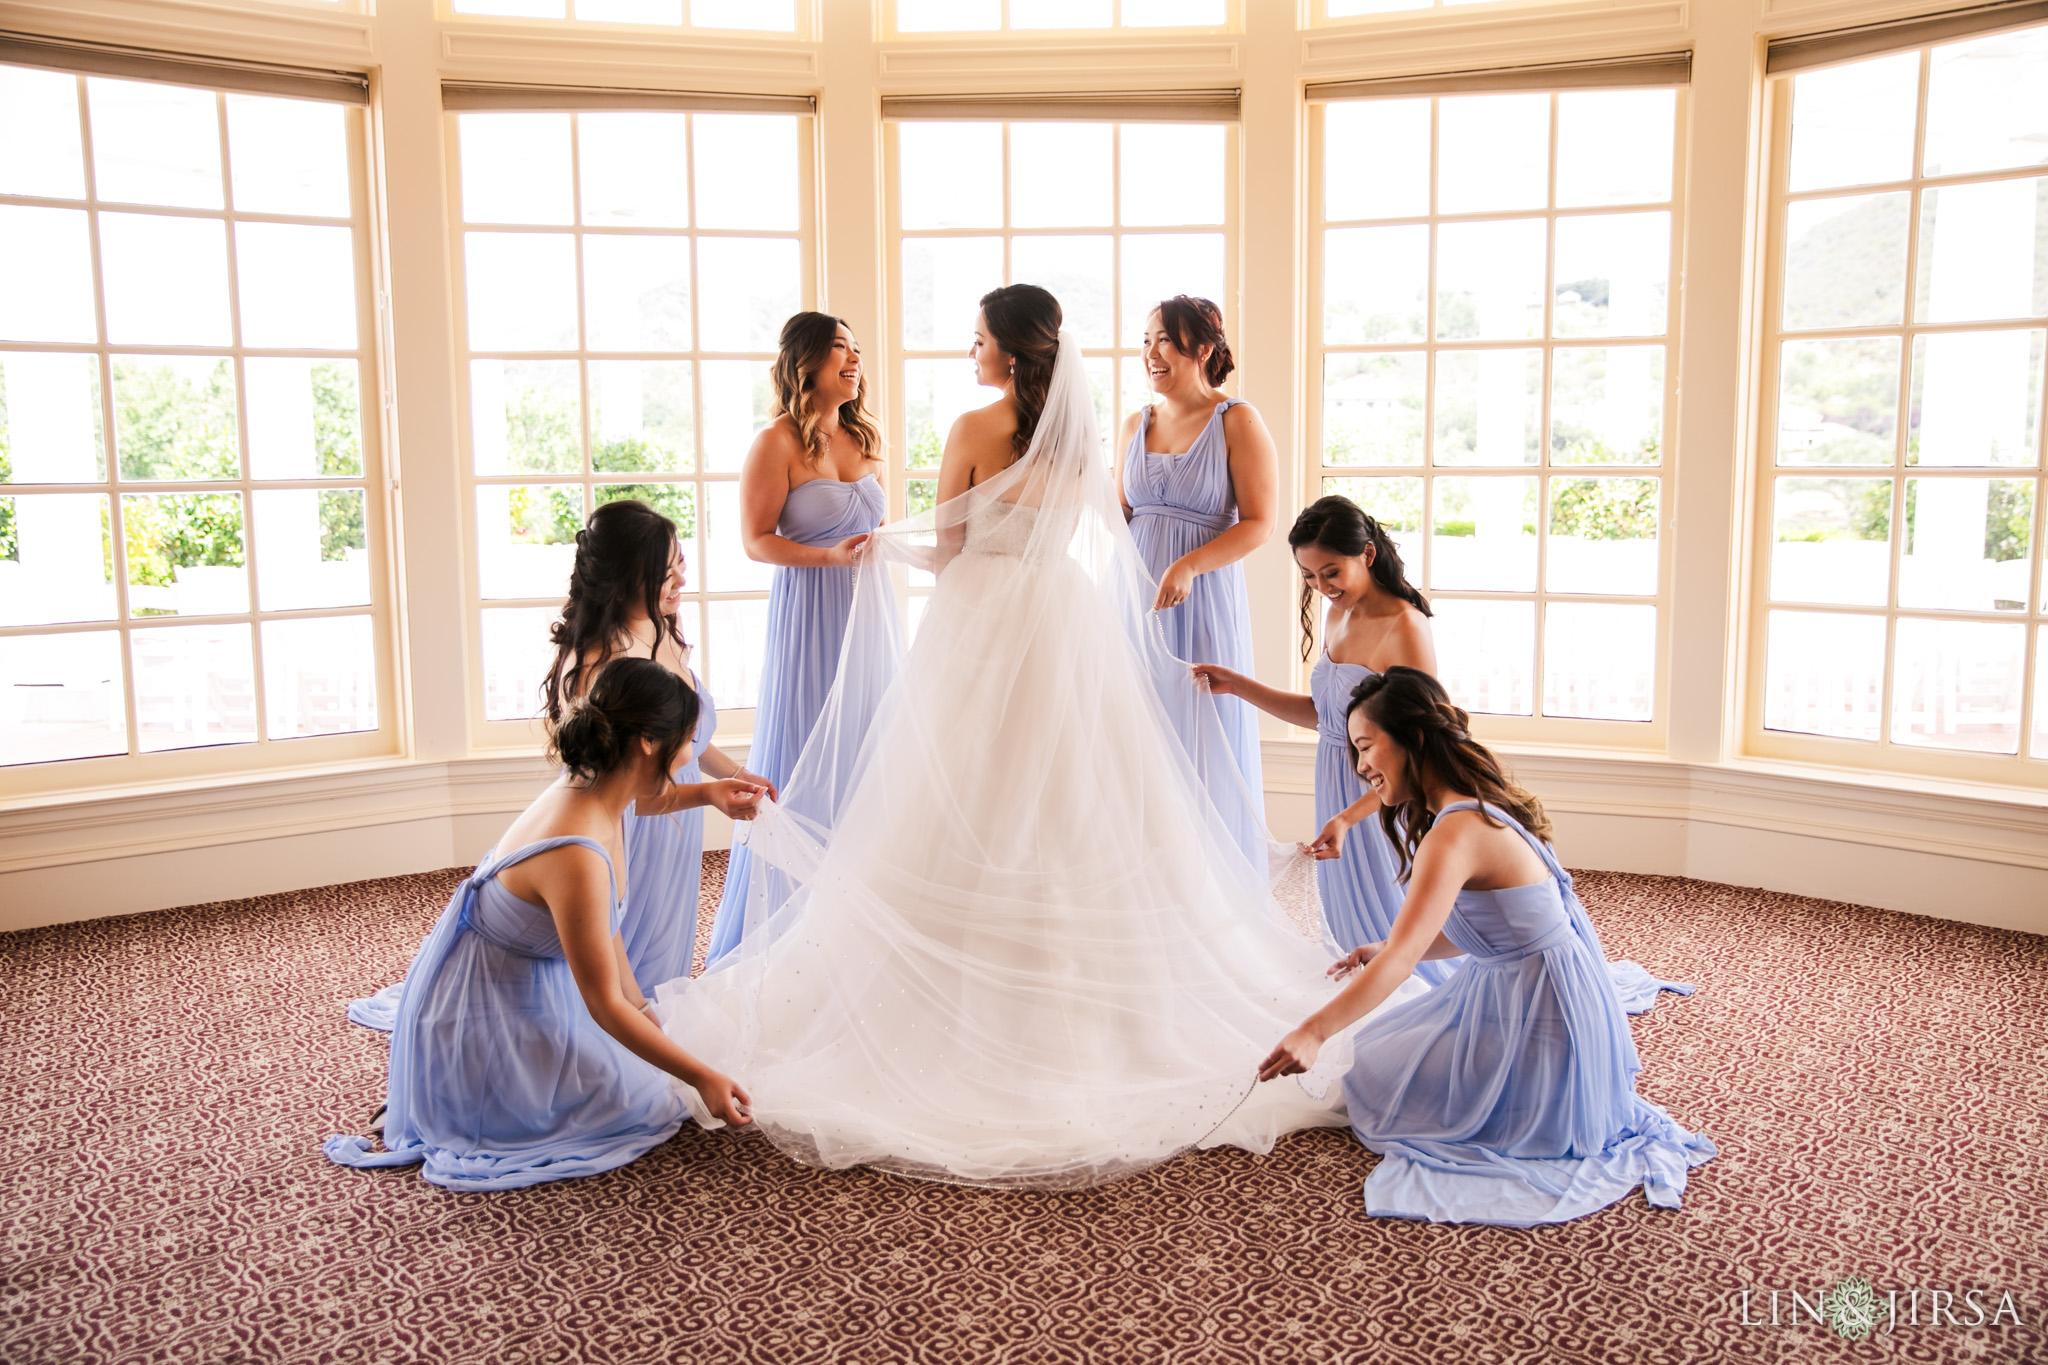 004 sherwood country club ventura county bridesmaids wedding photography